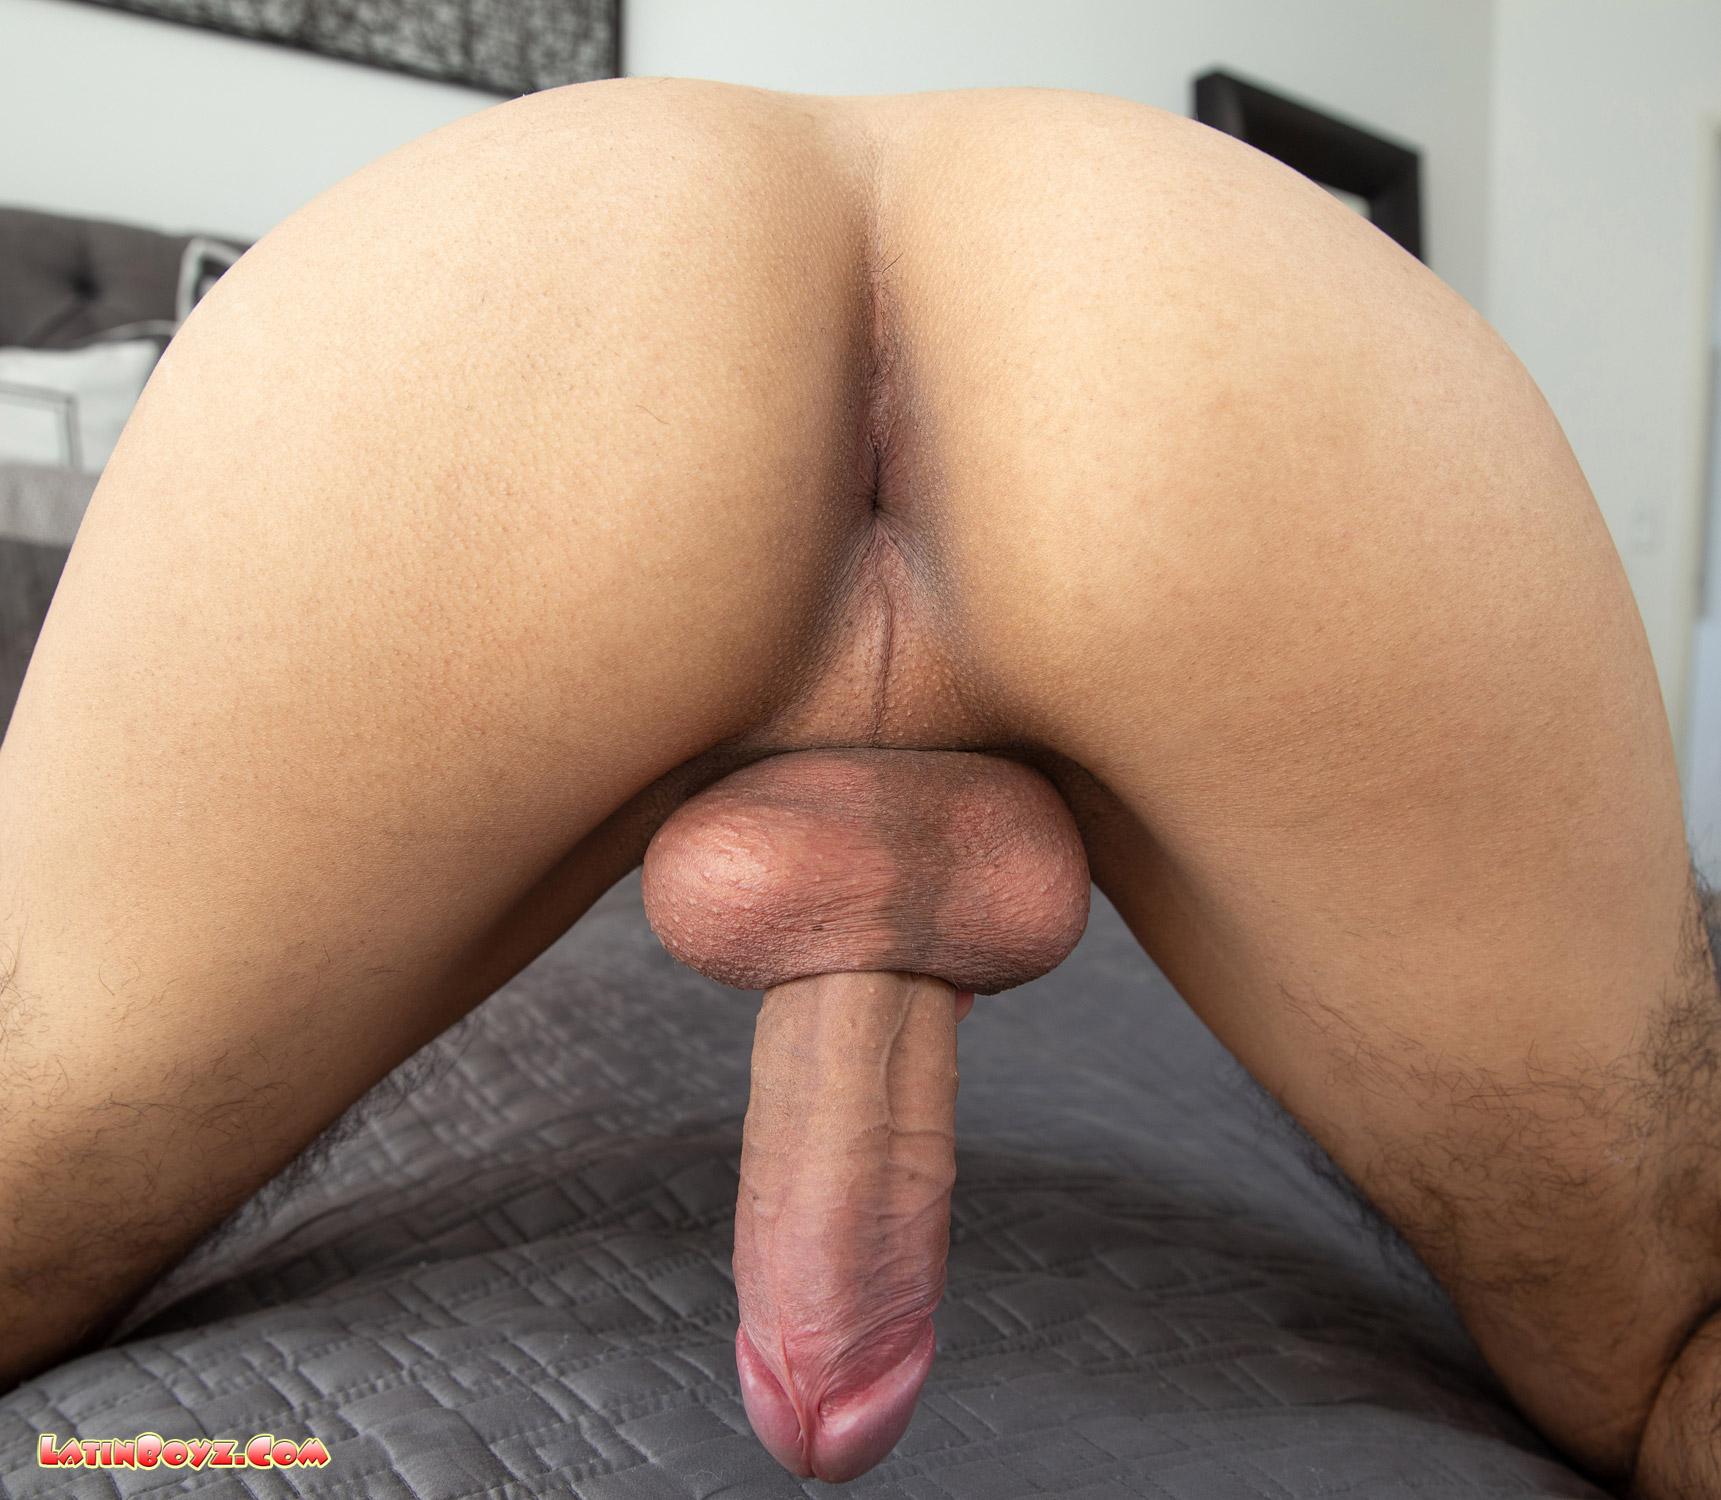 Venicio's Latino twink ass and dick